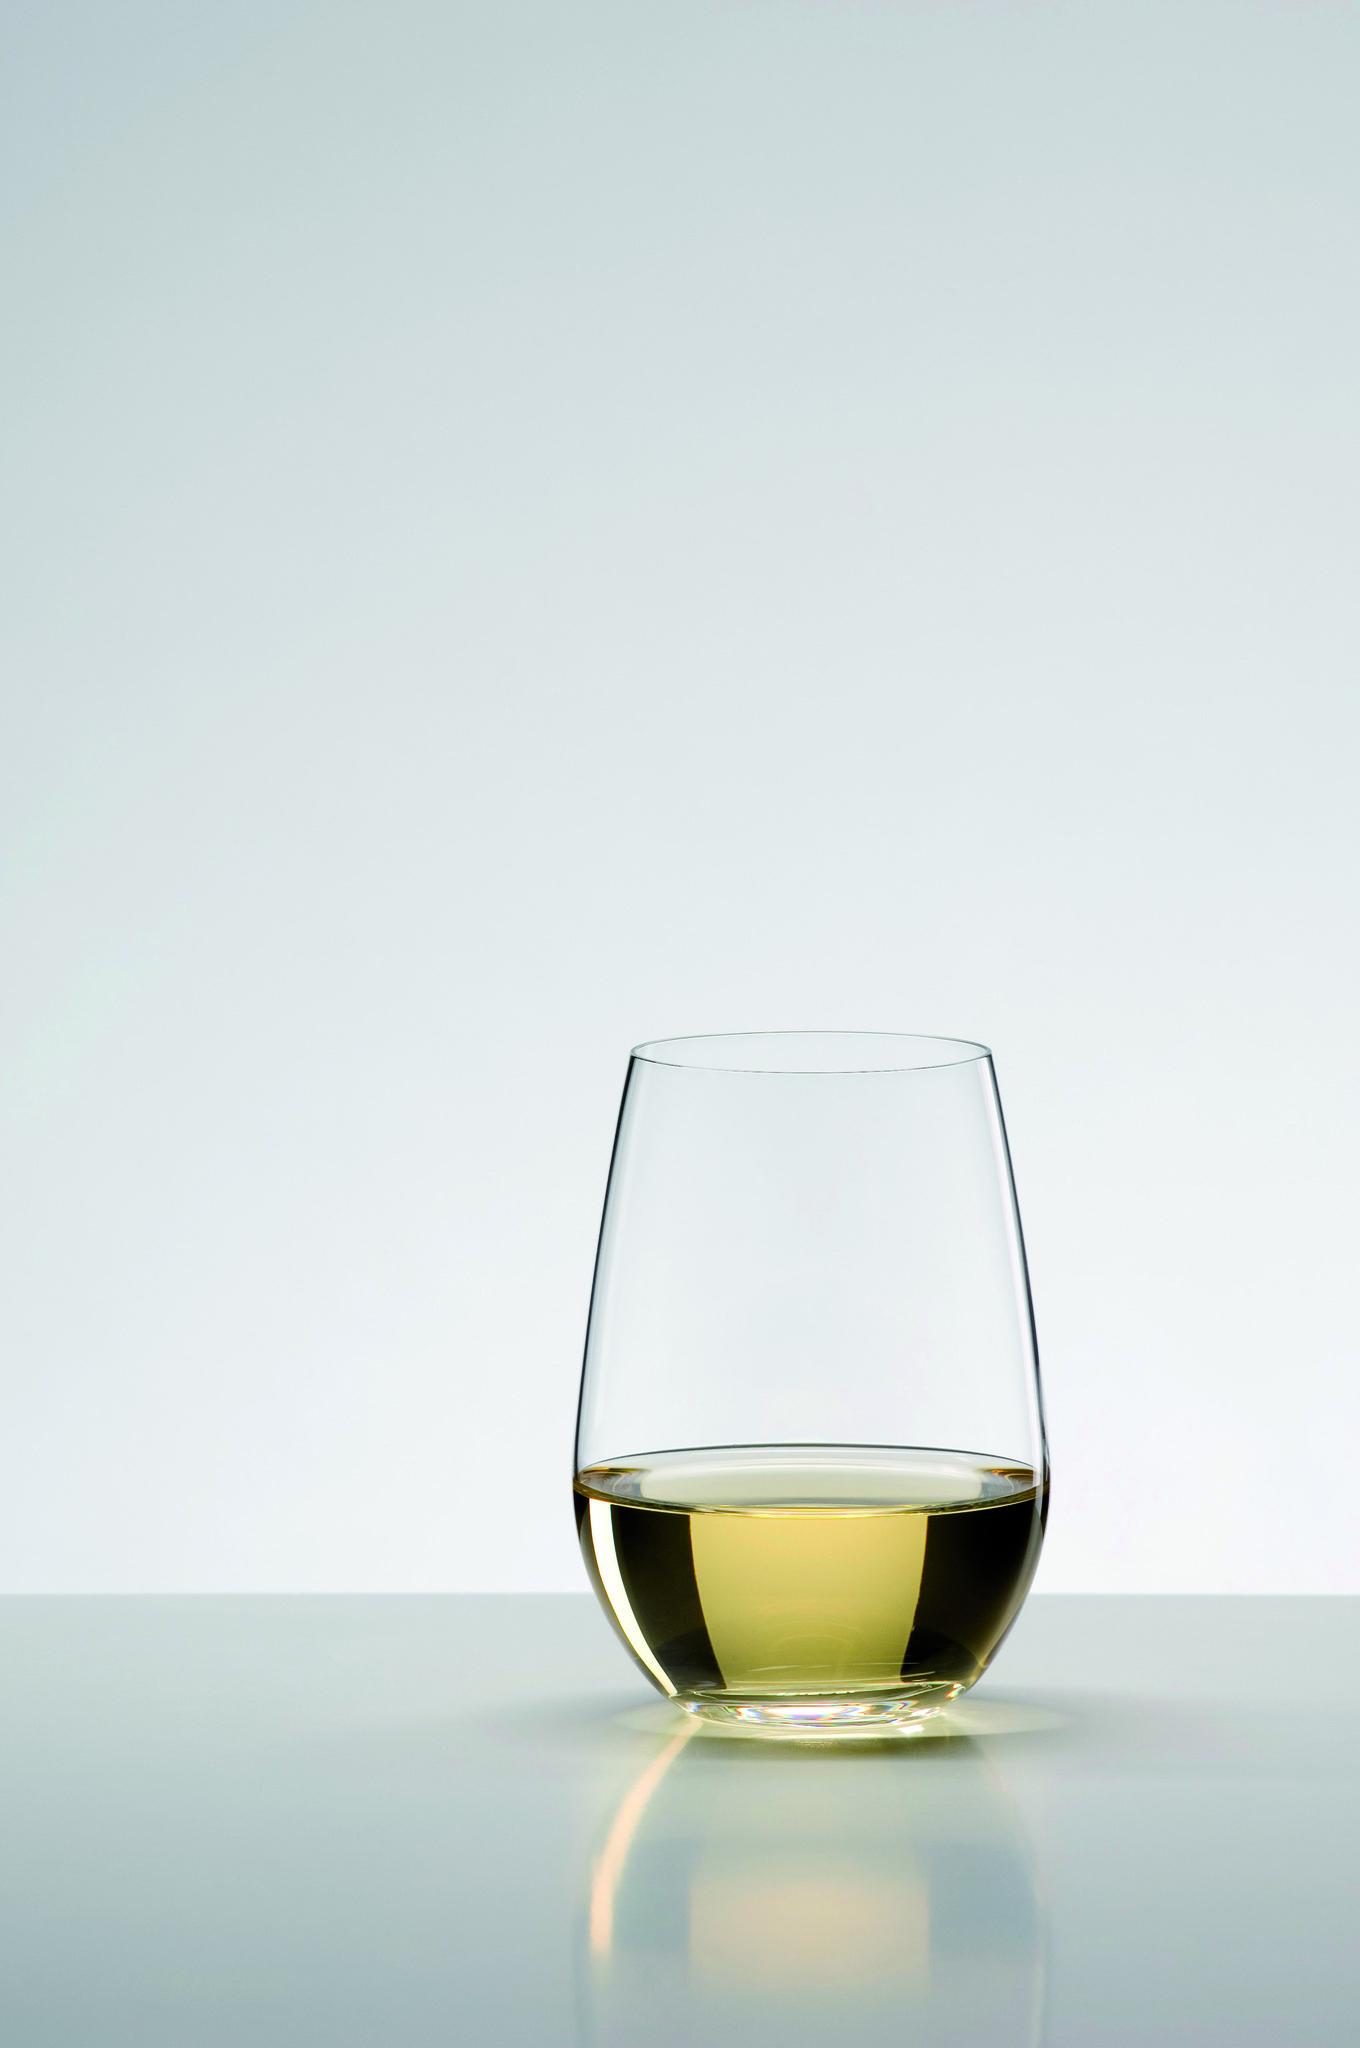 Бокалы Набор бокалов для вина 2шт 375мл Riedel The O Wine Tumbler Riesling/Sauvignon Blanc nabor-bokalov-dlya-vina-2-sht-375-ml-riedel-the-o-wine-tumbler-rieslingsauvignon-blanc-avstriya-.jpg